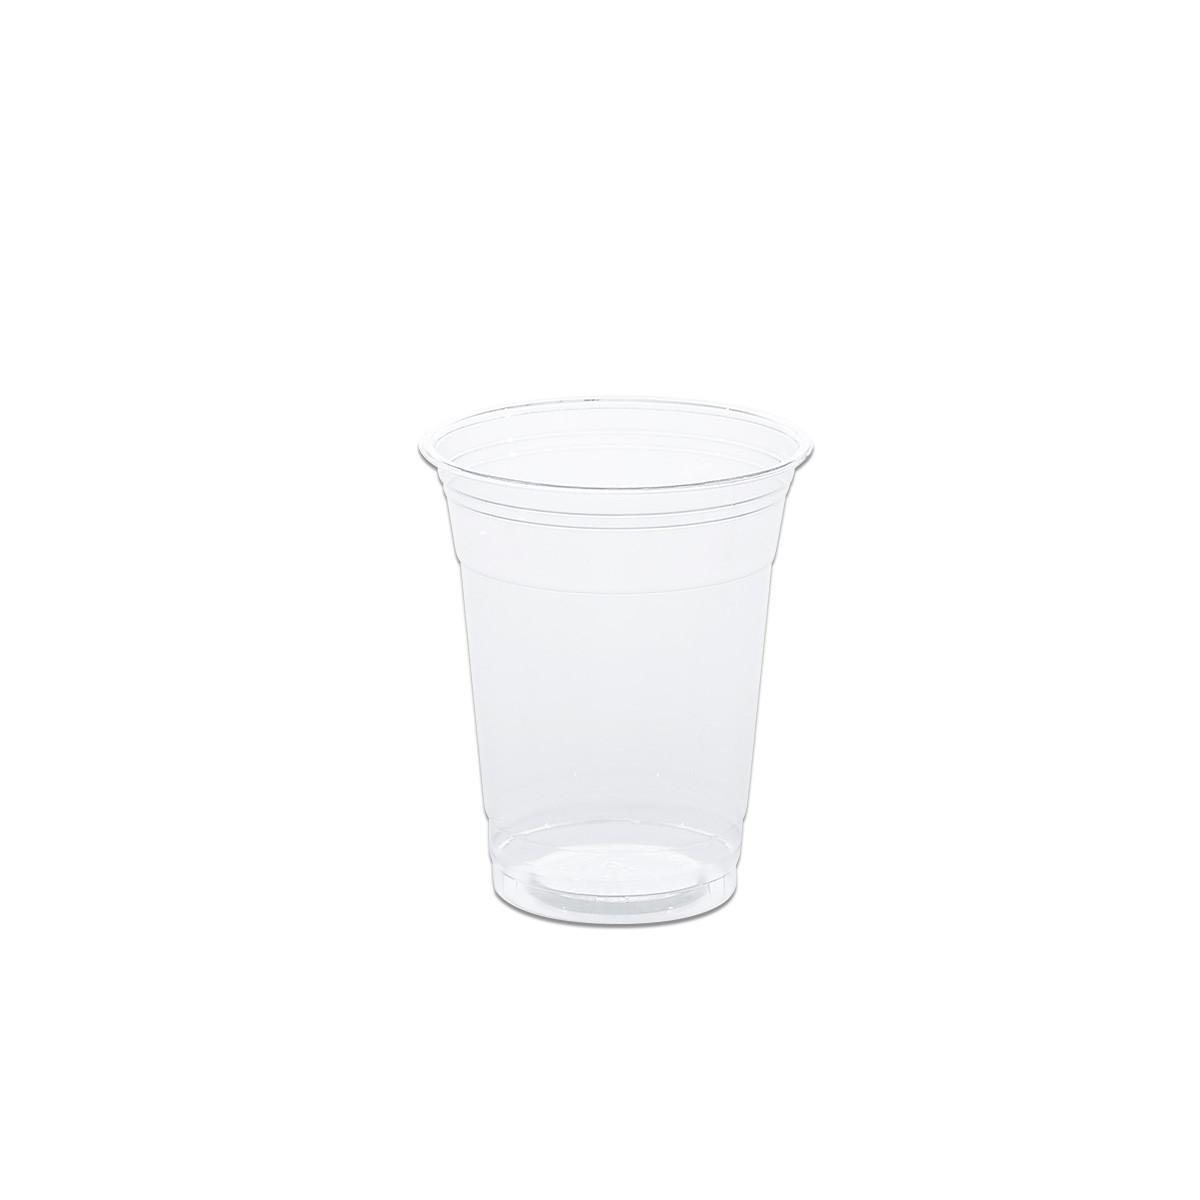 Clear Plastic Cups 10oz - PP   50pcsx20pkts